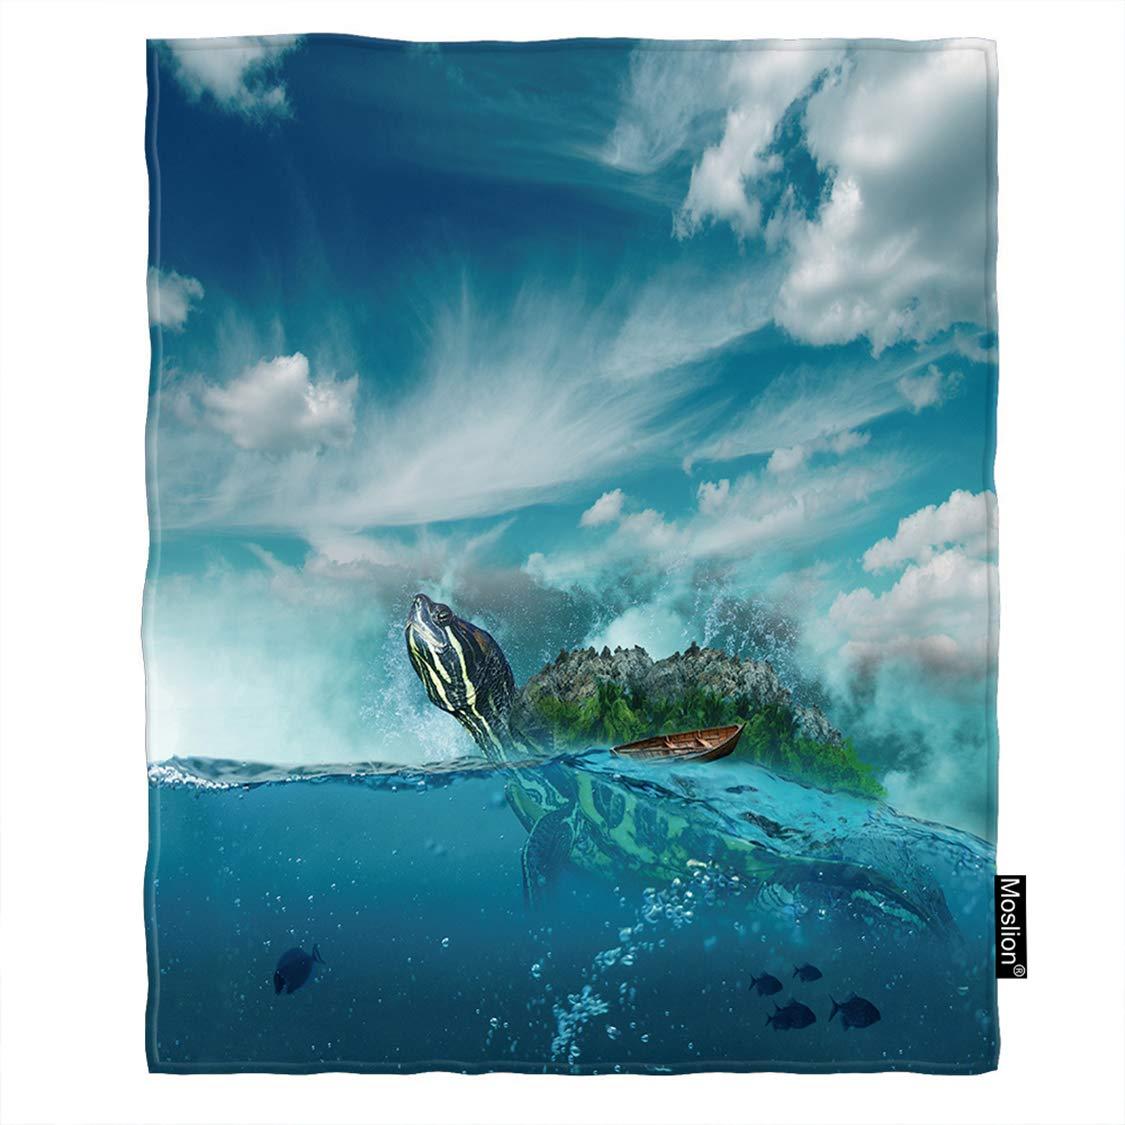 Moslion タートルスローブランケット 海 亀 海で泳ぐ 小さな魚 雲の下 空 ブランケット ホーム 装飾 フランネル 暖かい 旅行 ブランケット 30 x 40インチ ペット犬 猫用 ブルー 60*80 Inch BLANKETAZX-F268 B07L2JY9QC F267-1 60*80 Inch